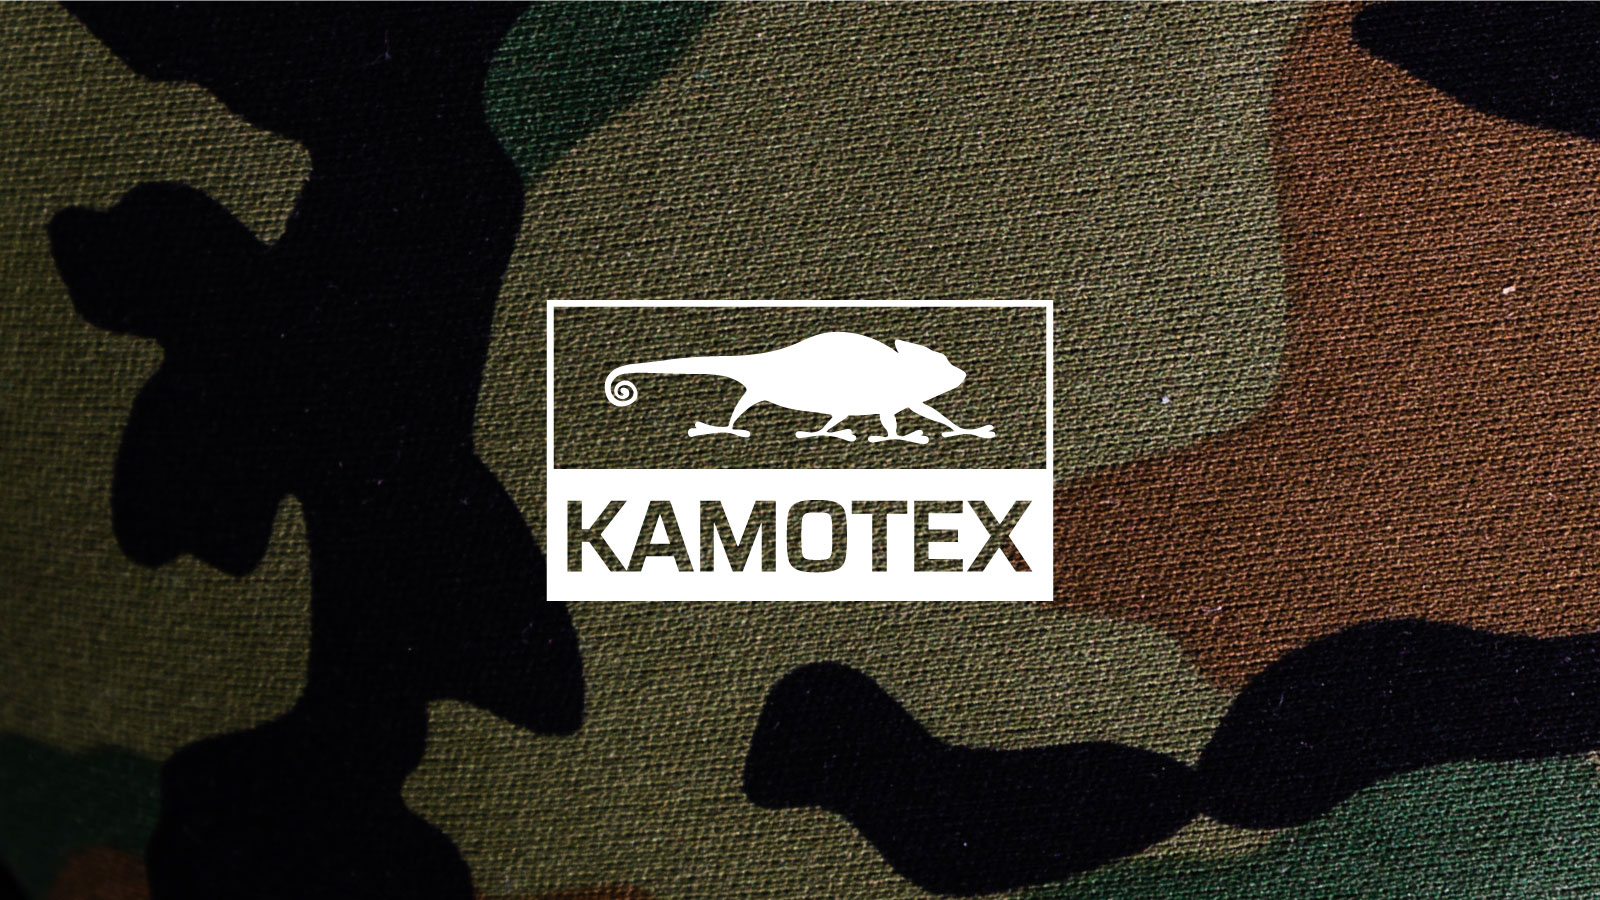 KAMOTEX white logo lockup with military camouflage background